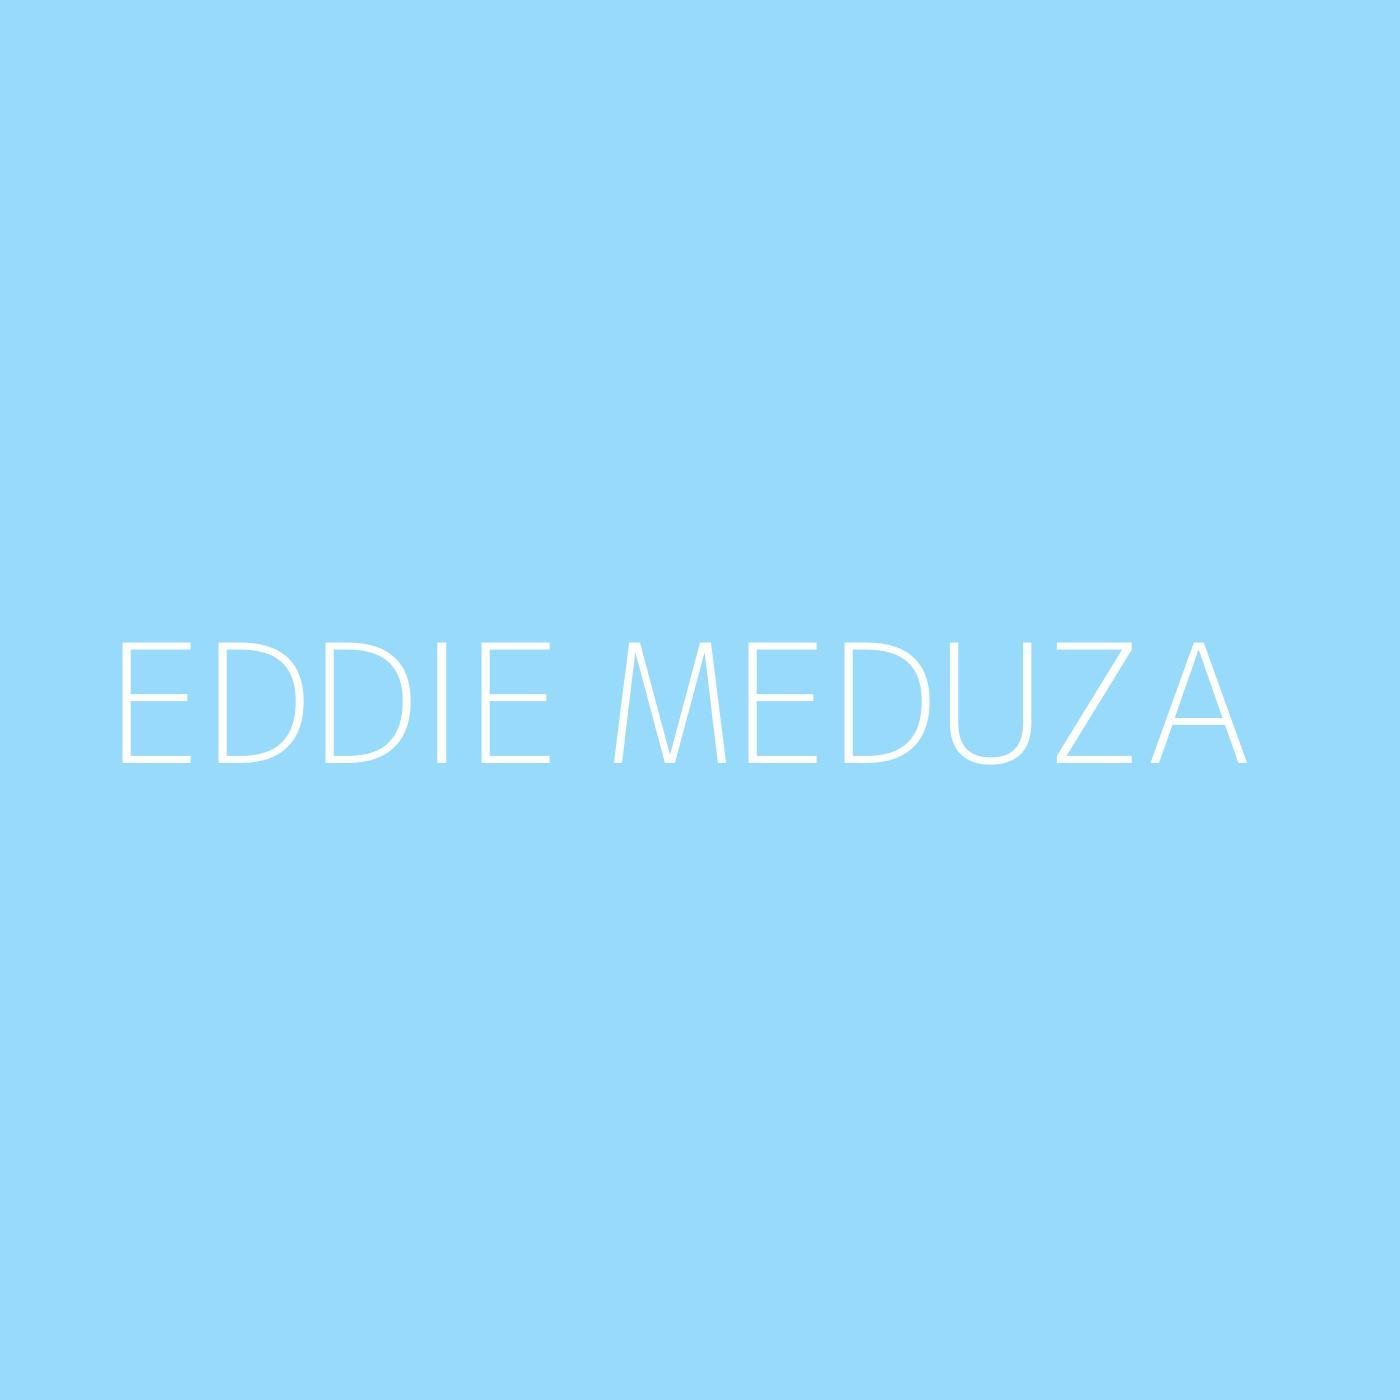 Eddie Meduza Playlist Artwork